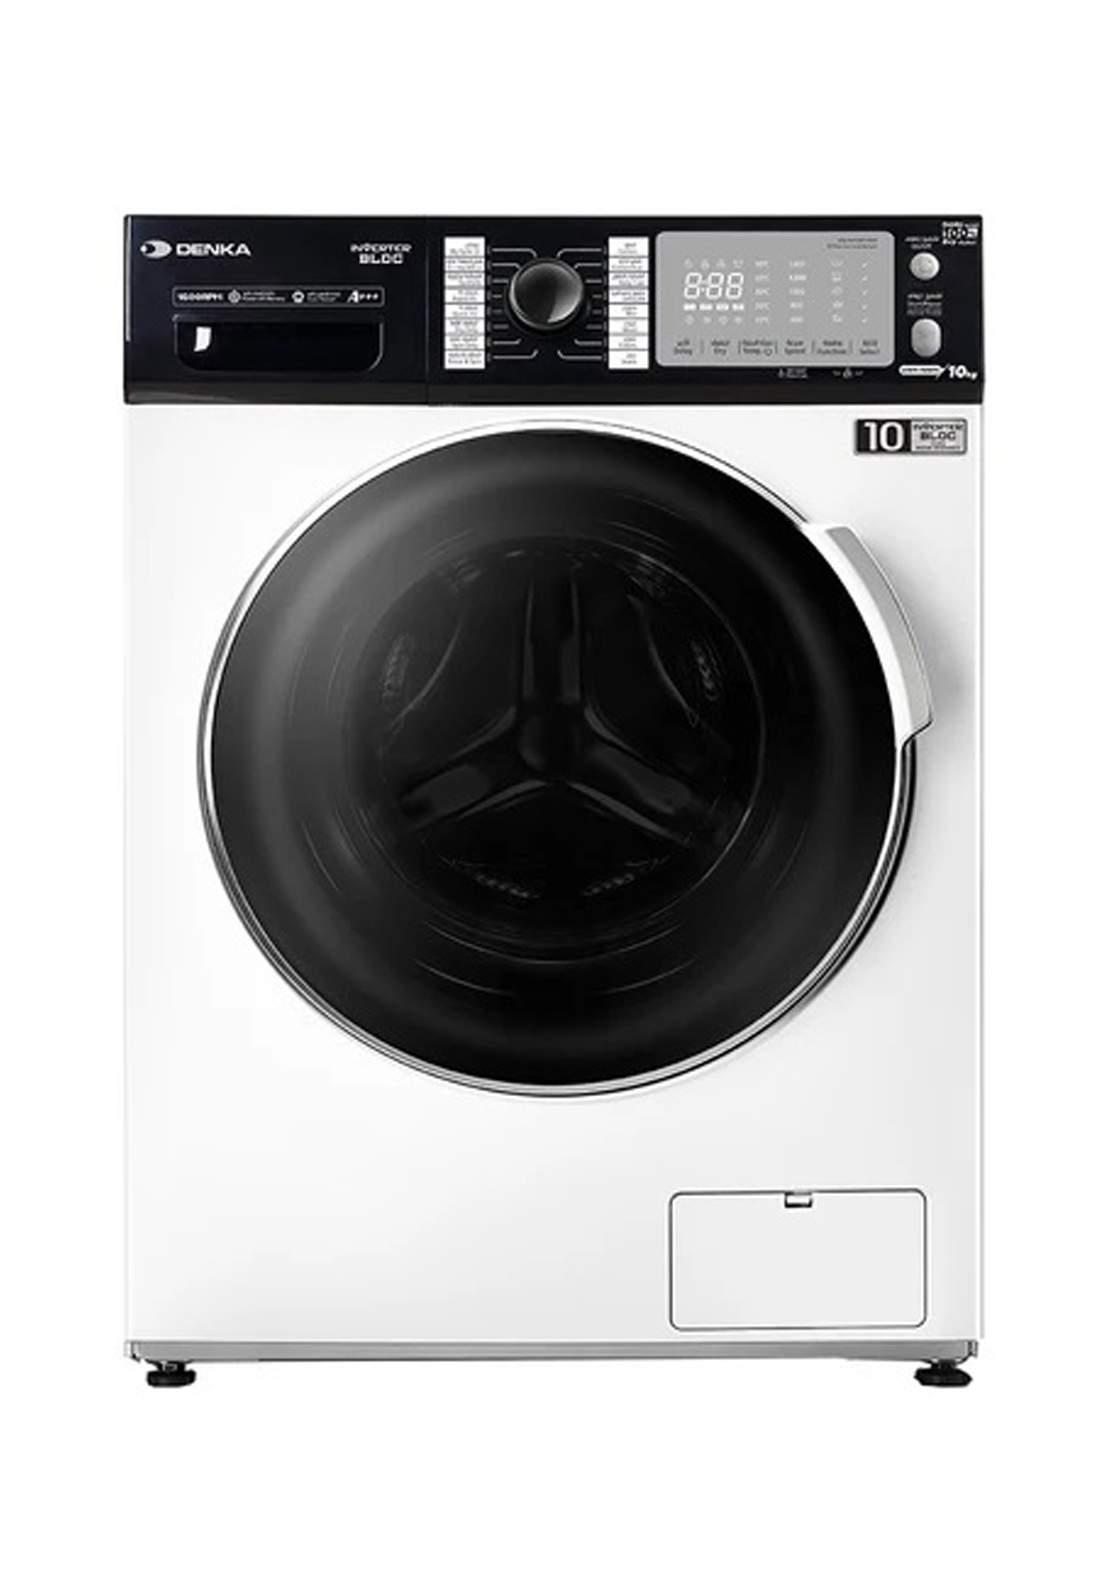 DENKA UIWM-11DWFL washing machine 10kg  غسالة ملابس